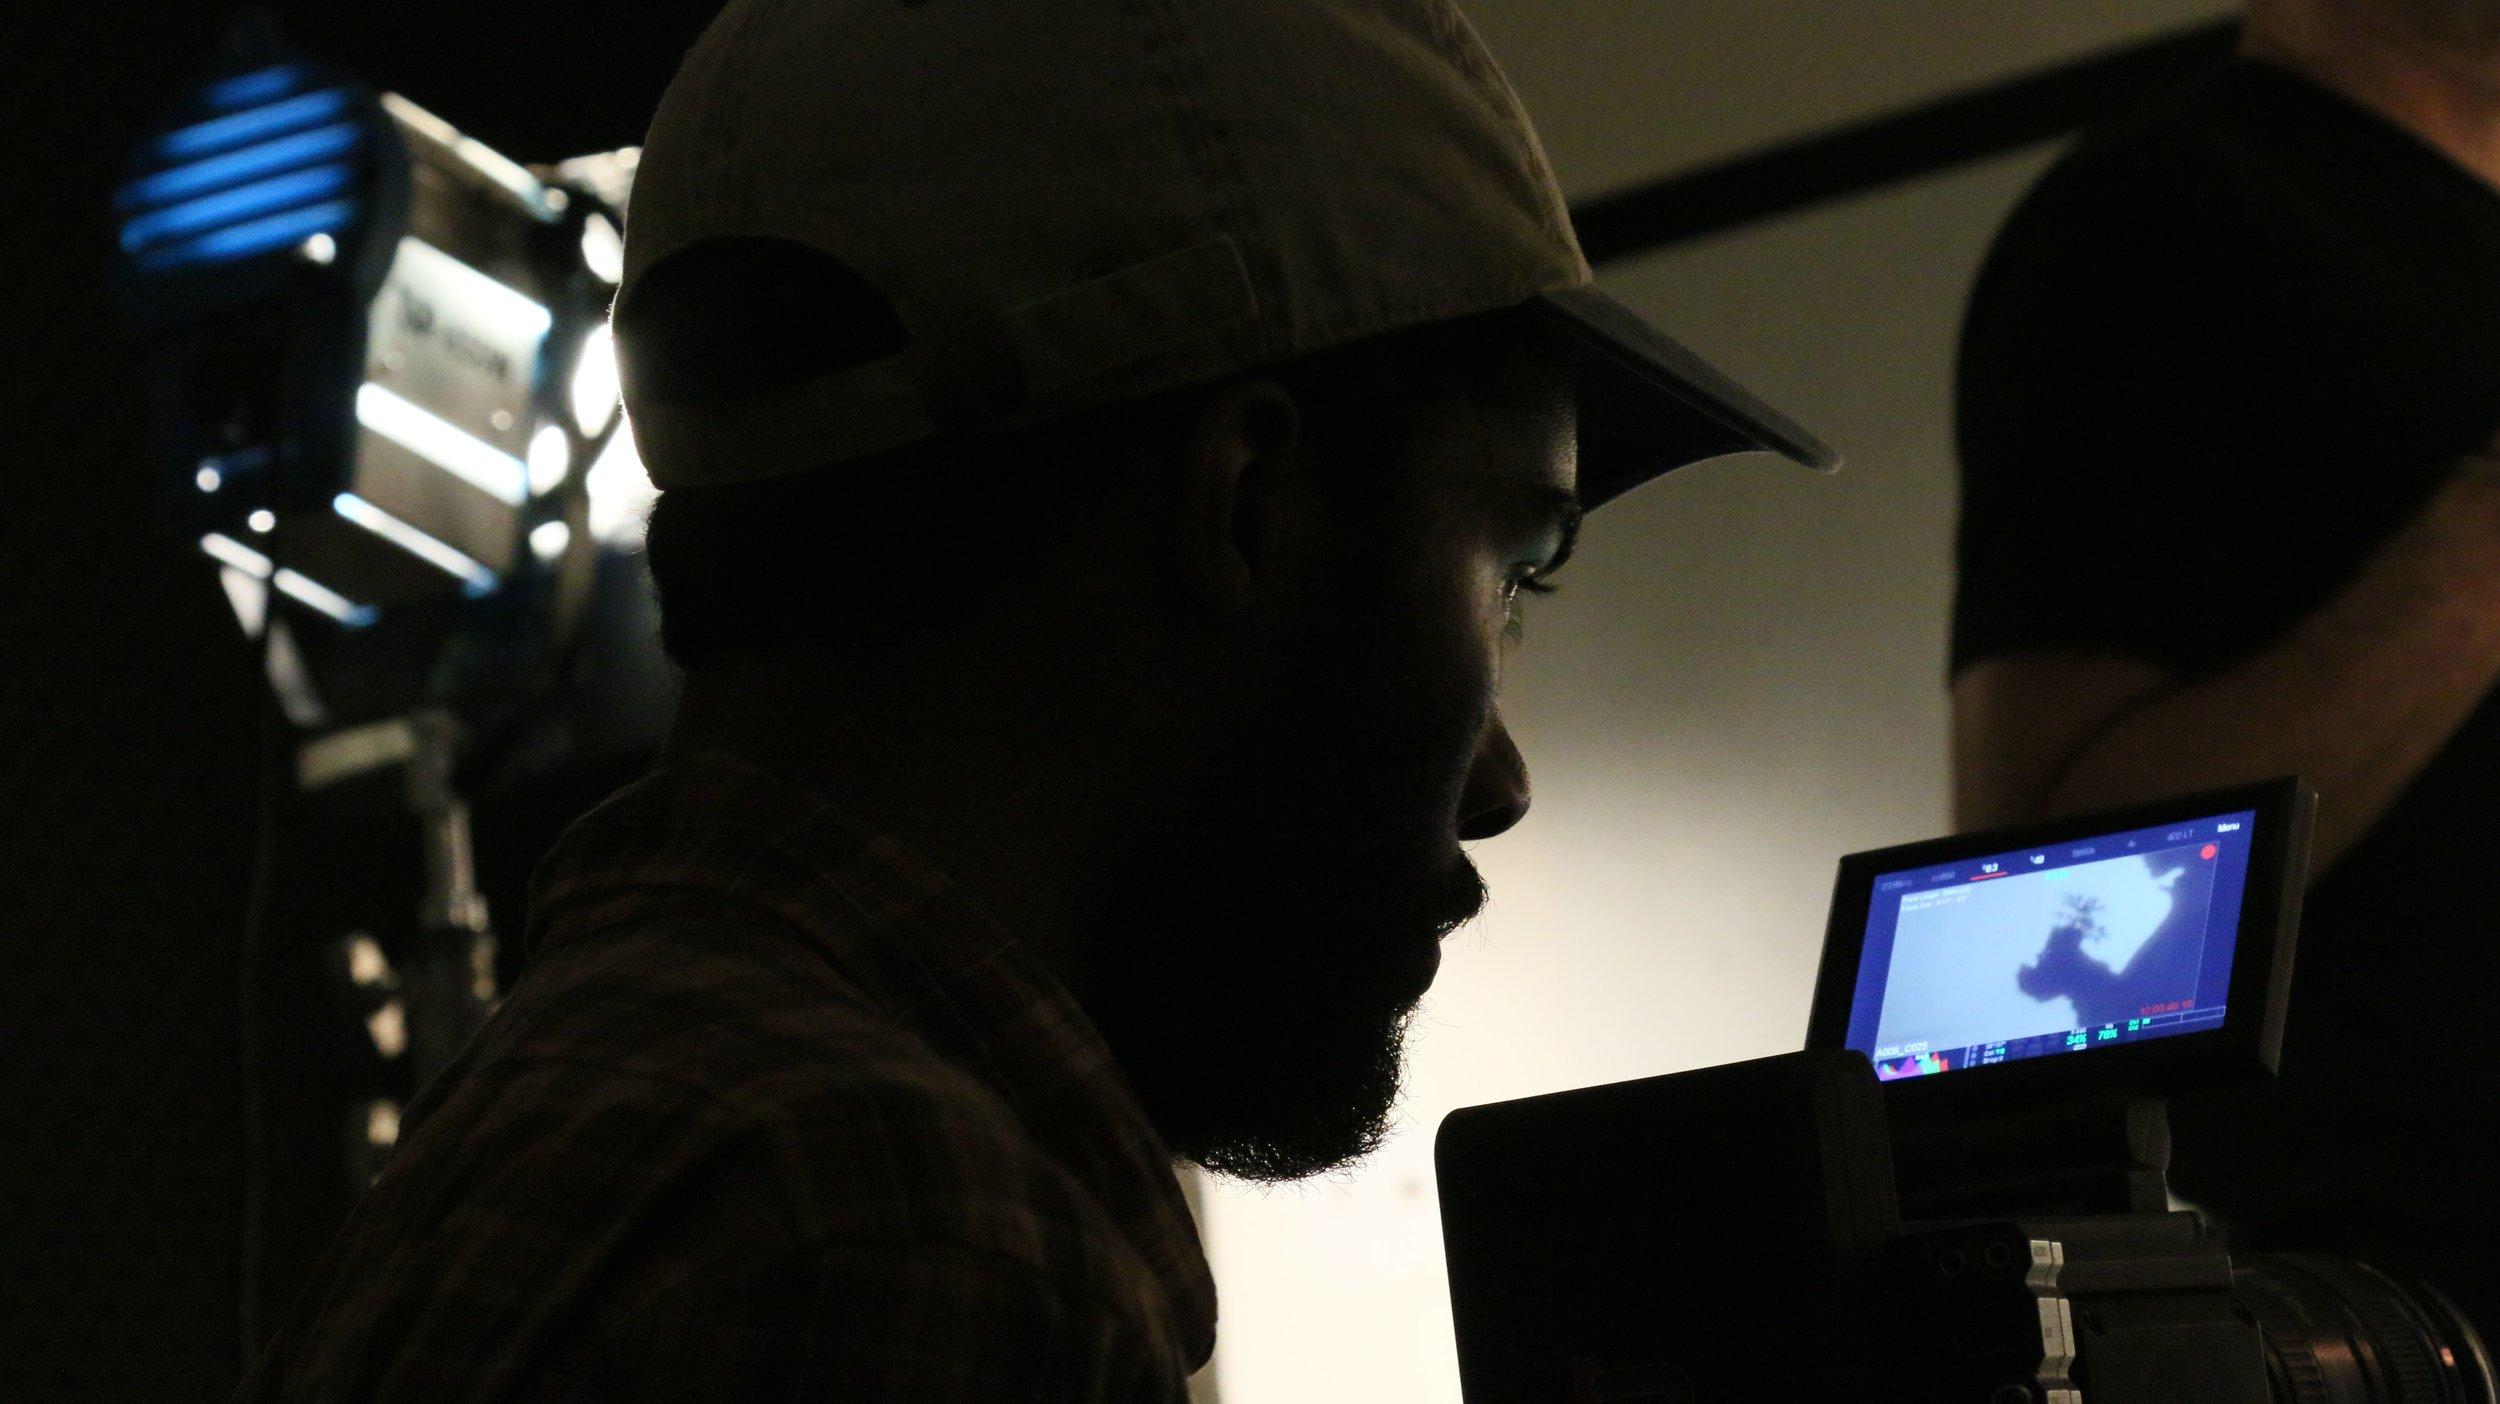 Photo courtesy of Digital Film Academy